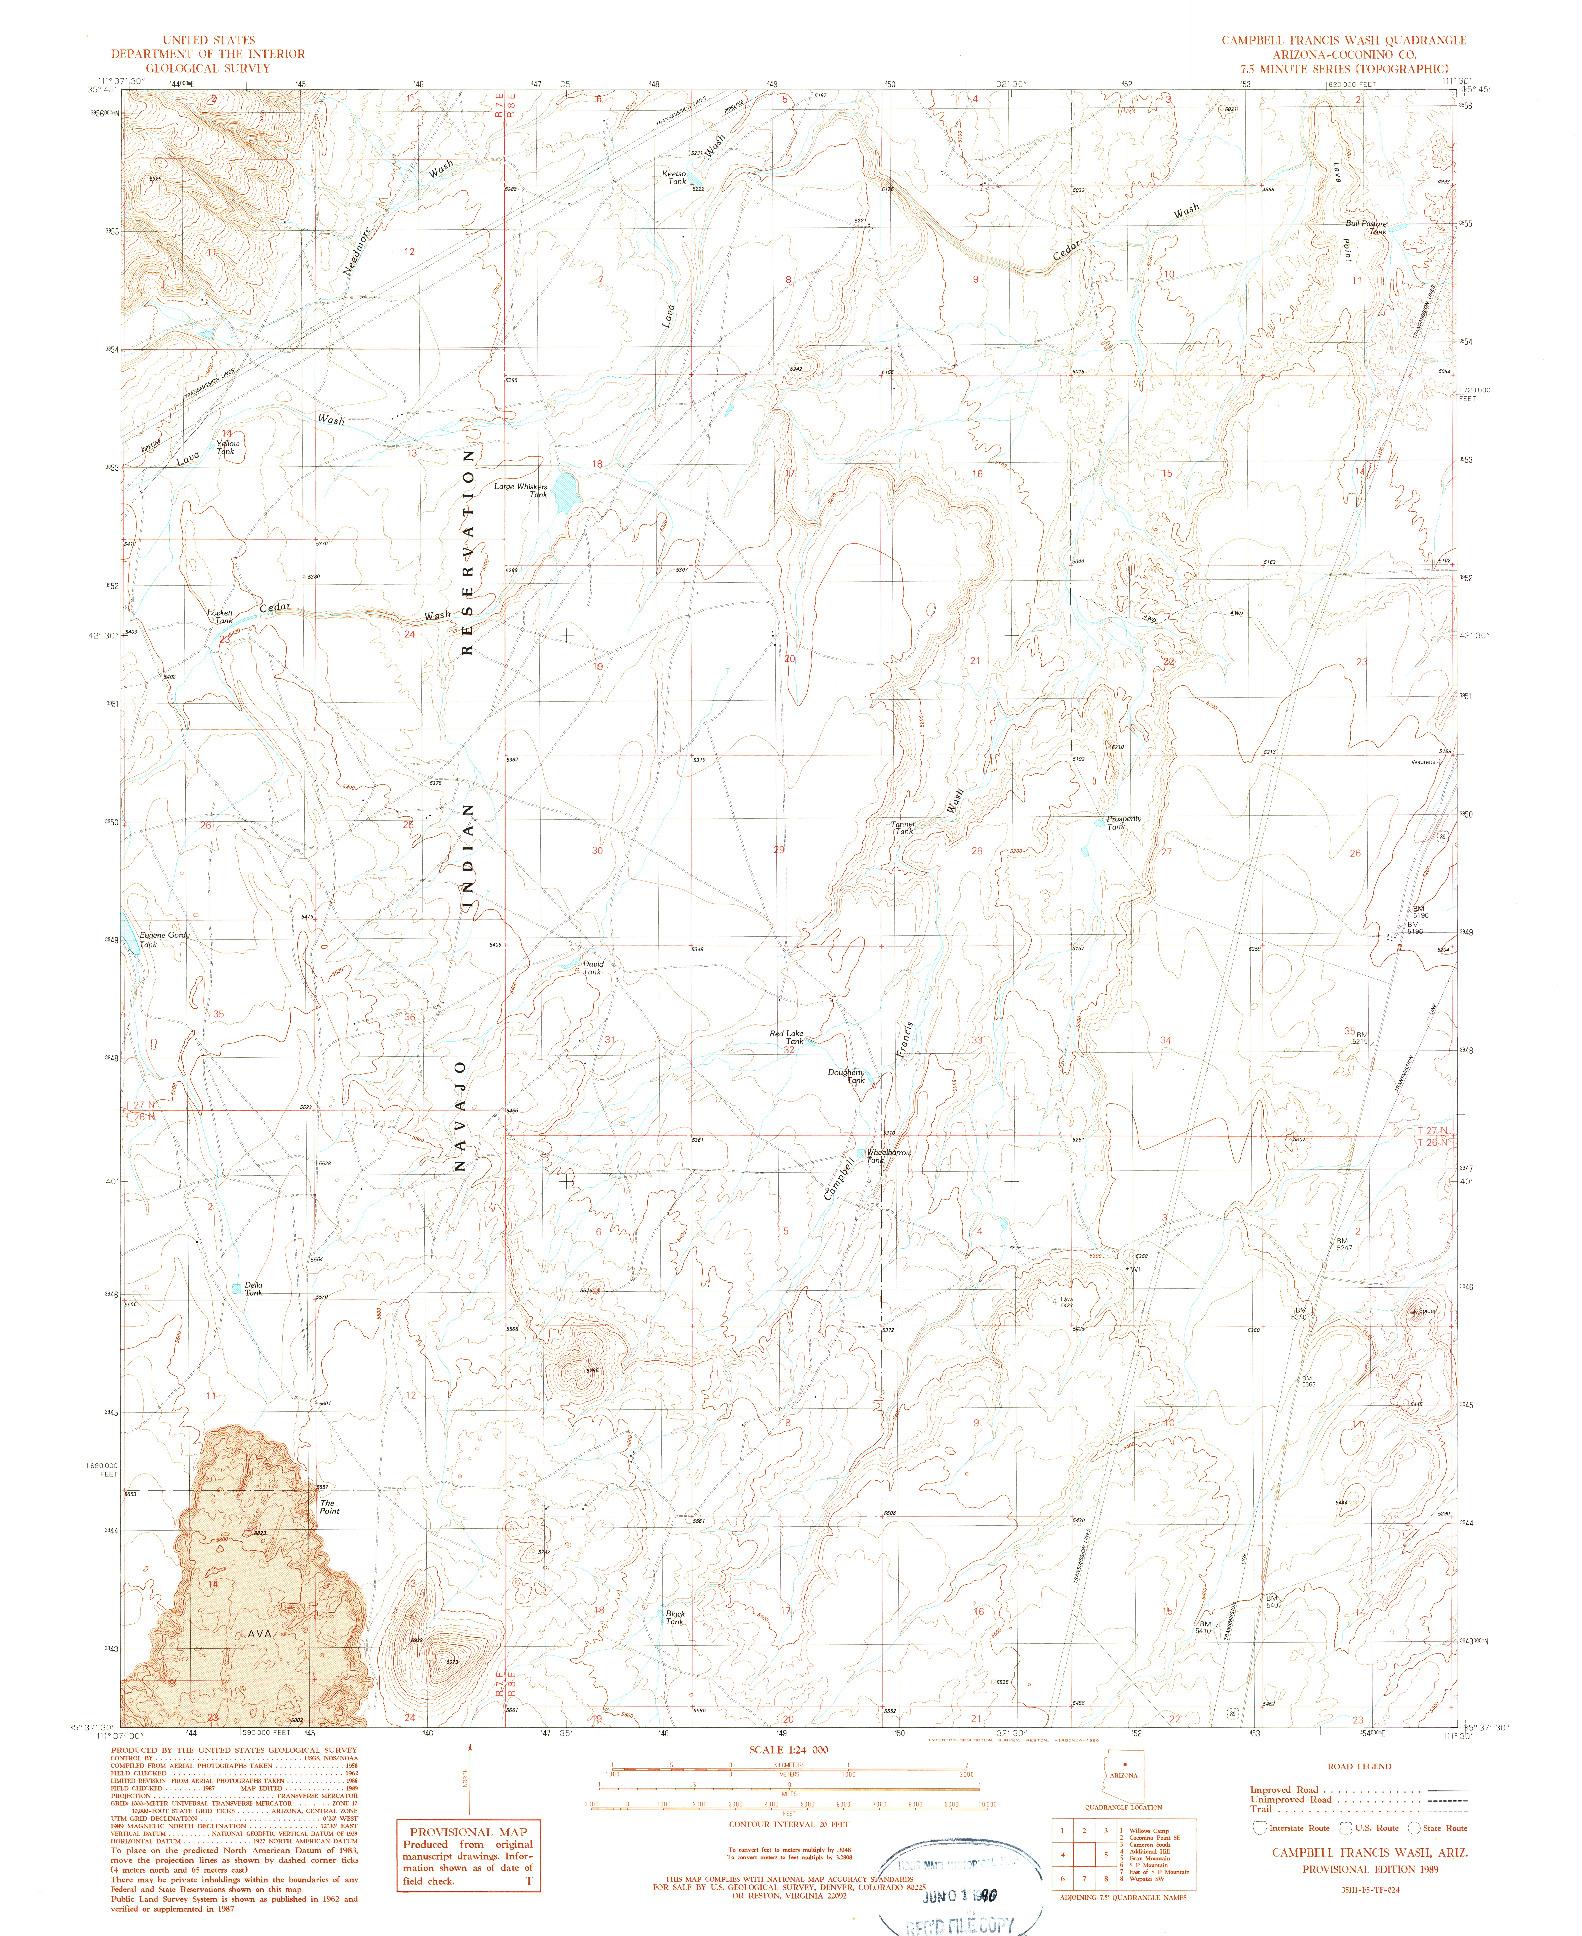 USGS 1:24000-SCALE QUADRANGLE FOR CAMPBELL FRANCIS WASH, AZ 1989